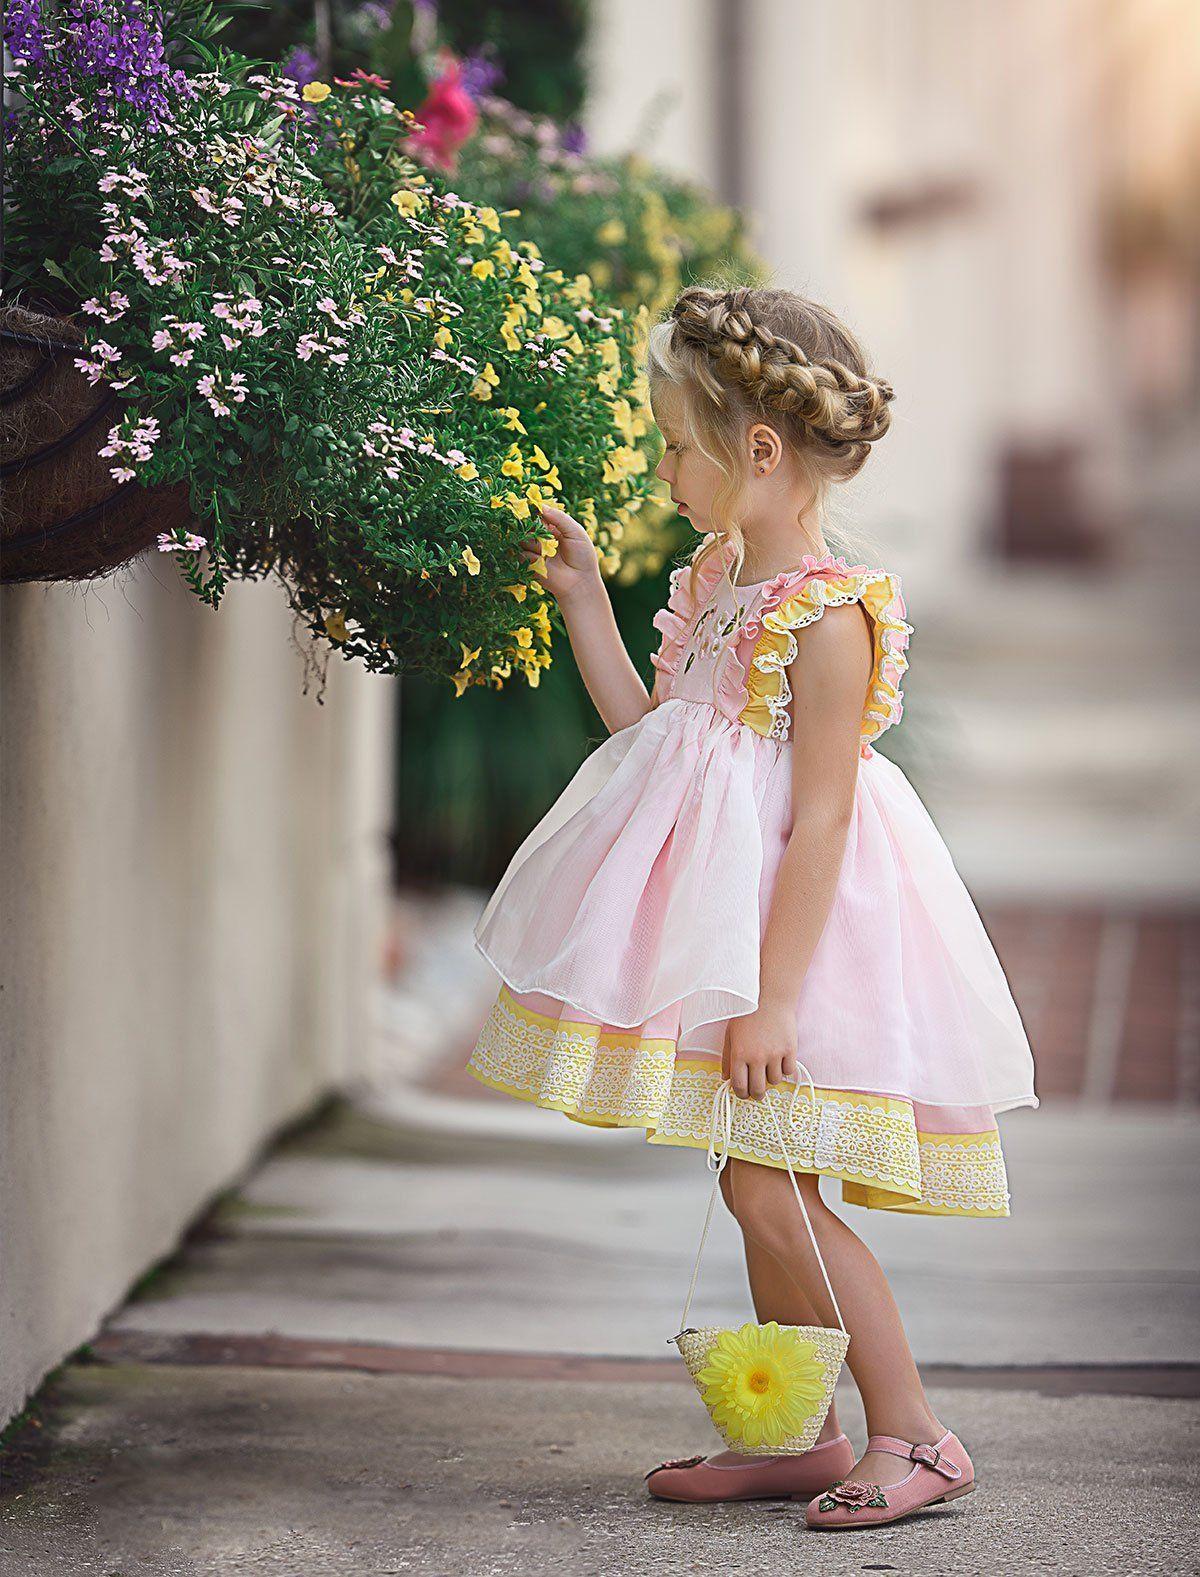 8853e3efe NEW DOLLCAKE I Believe in Angels Dress Pink Lemonade Size 7 Birthday  Wedding -  94.99